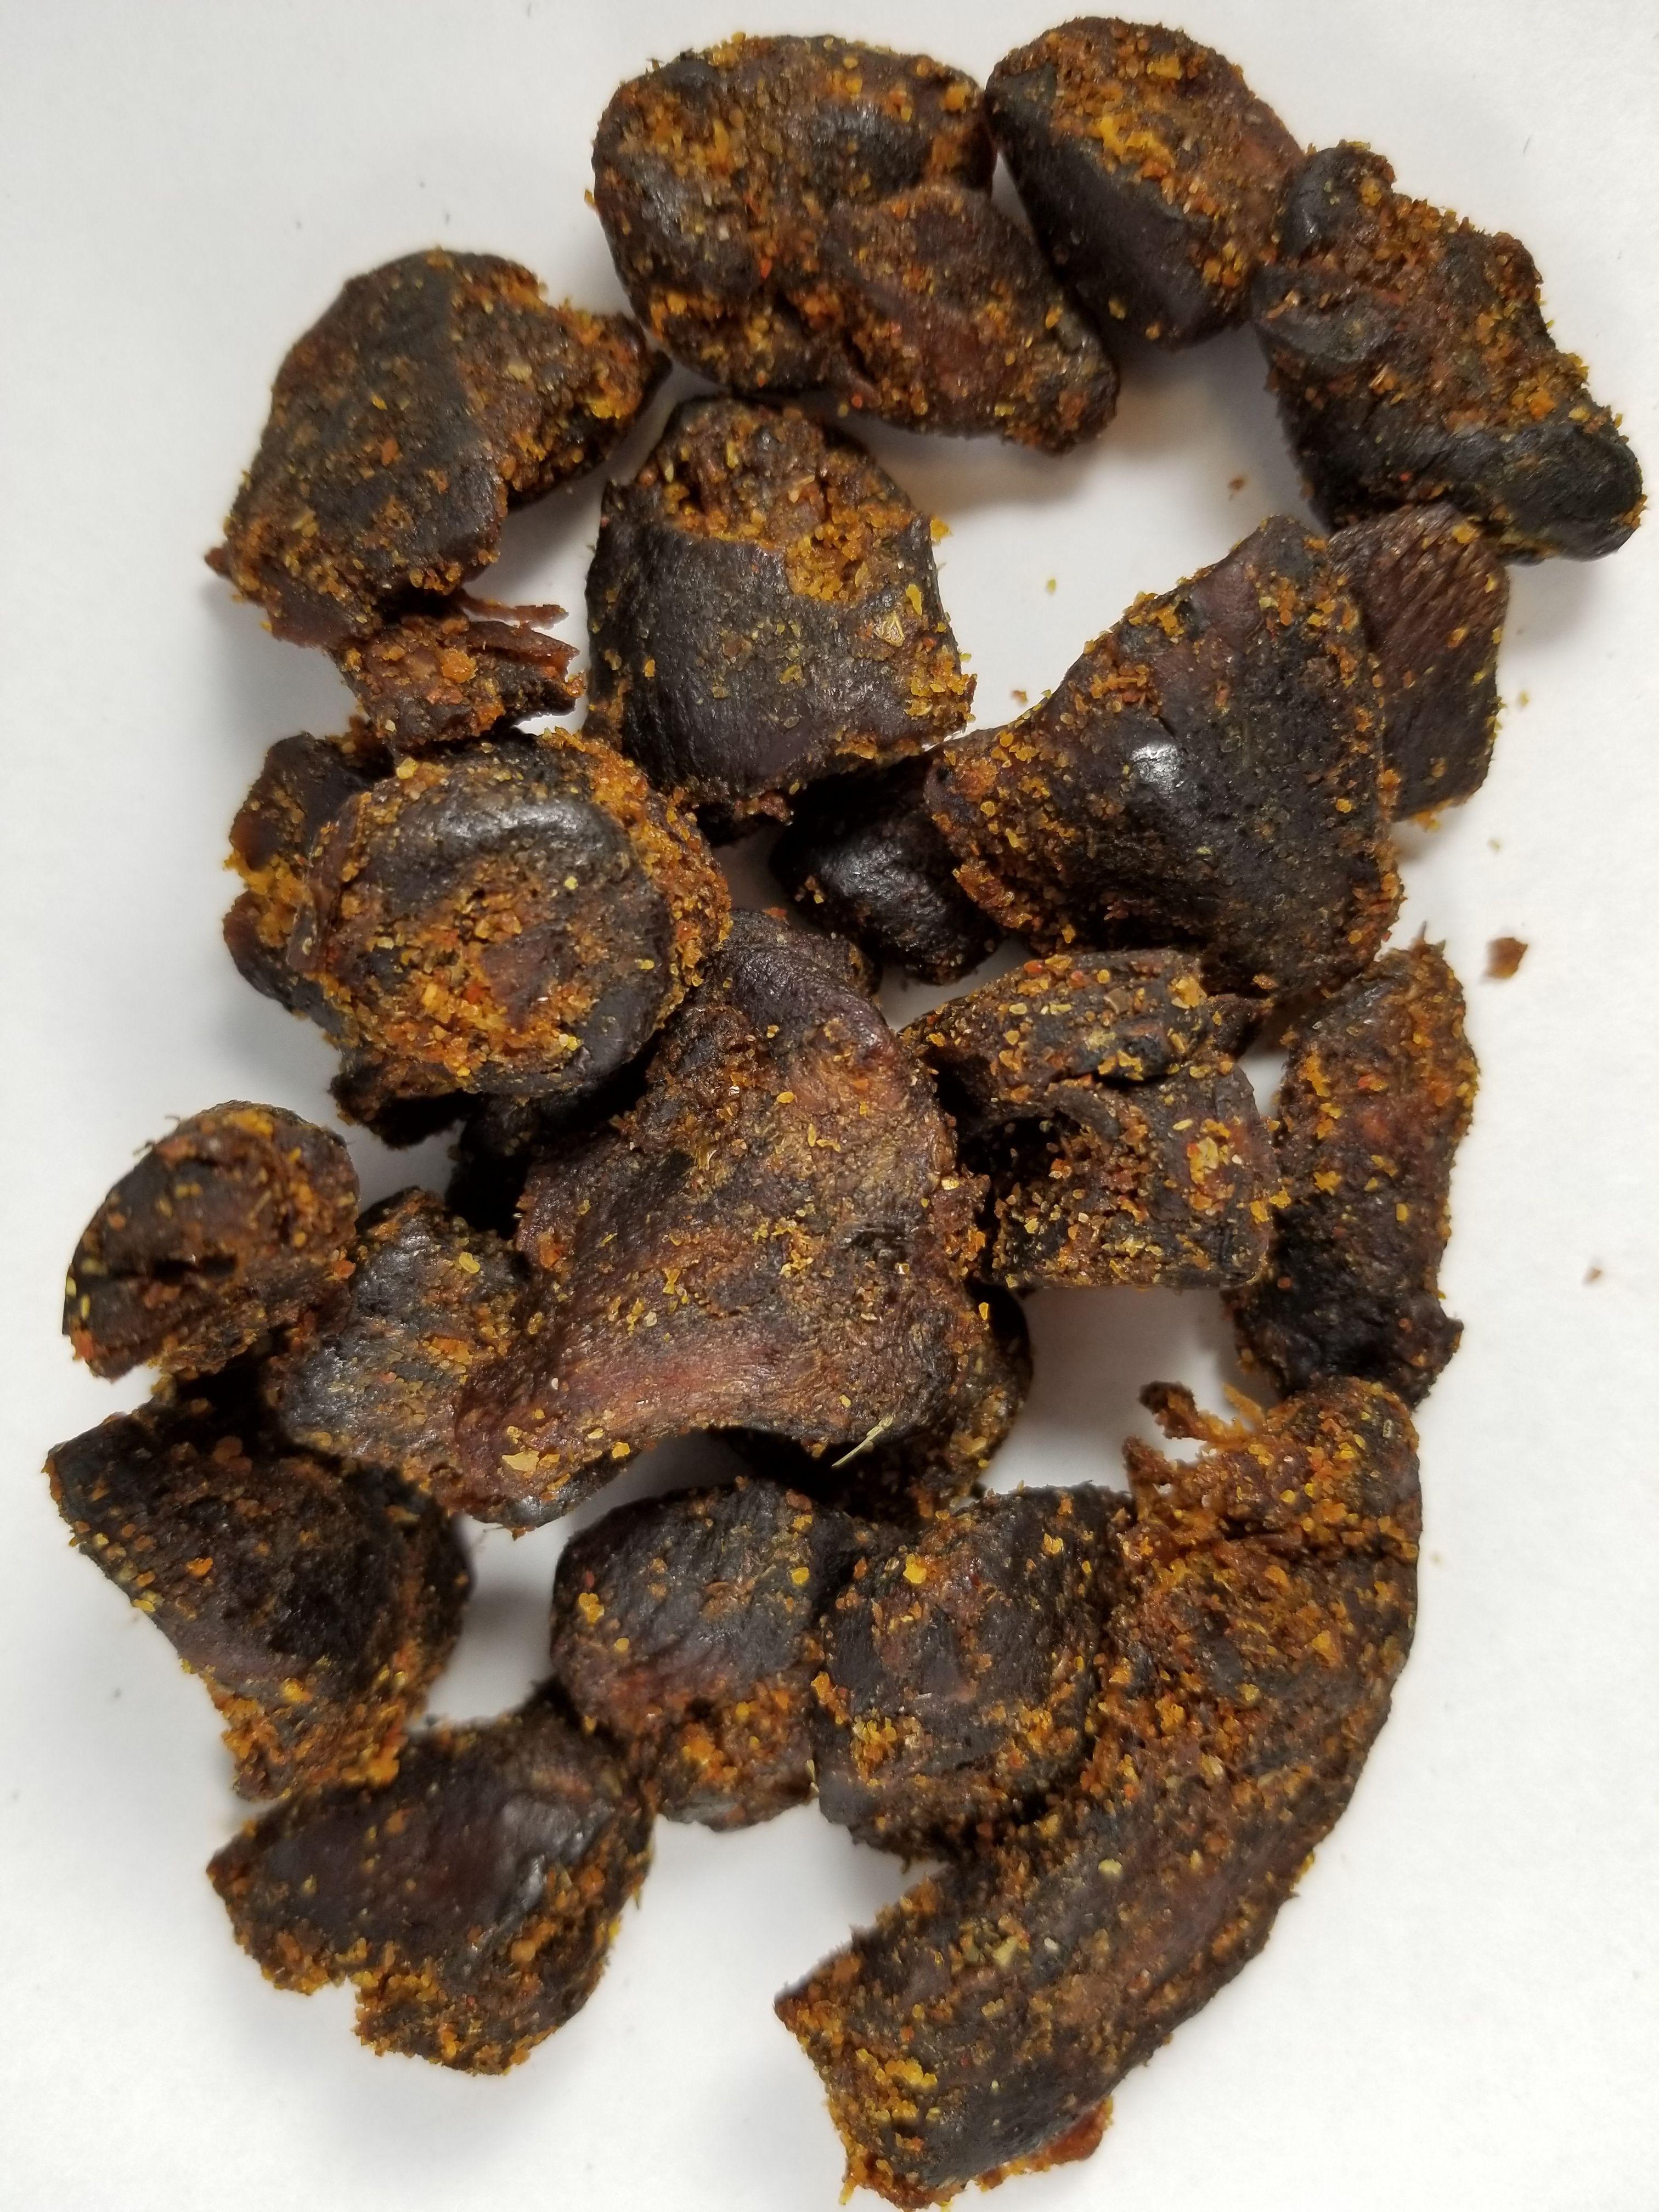 Pan's Mushroom Jerky Zesty Thai Mushroom Jerky (Review